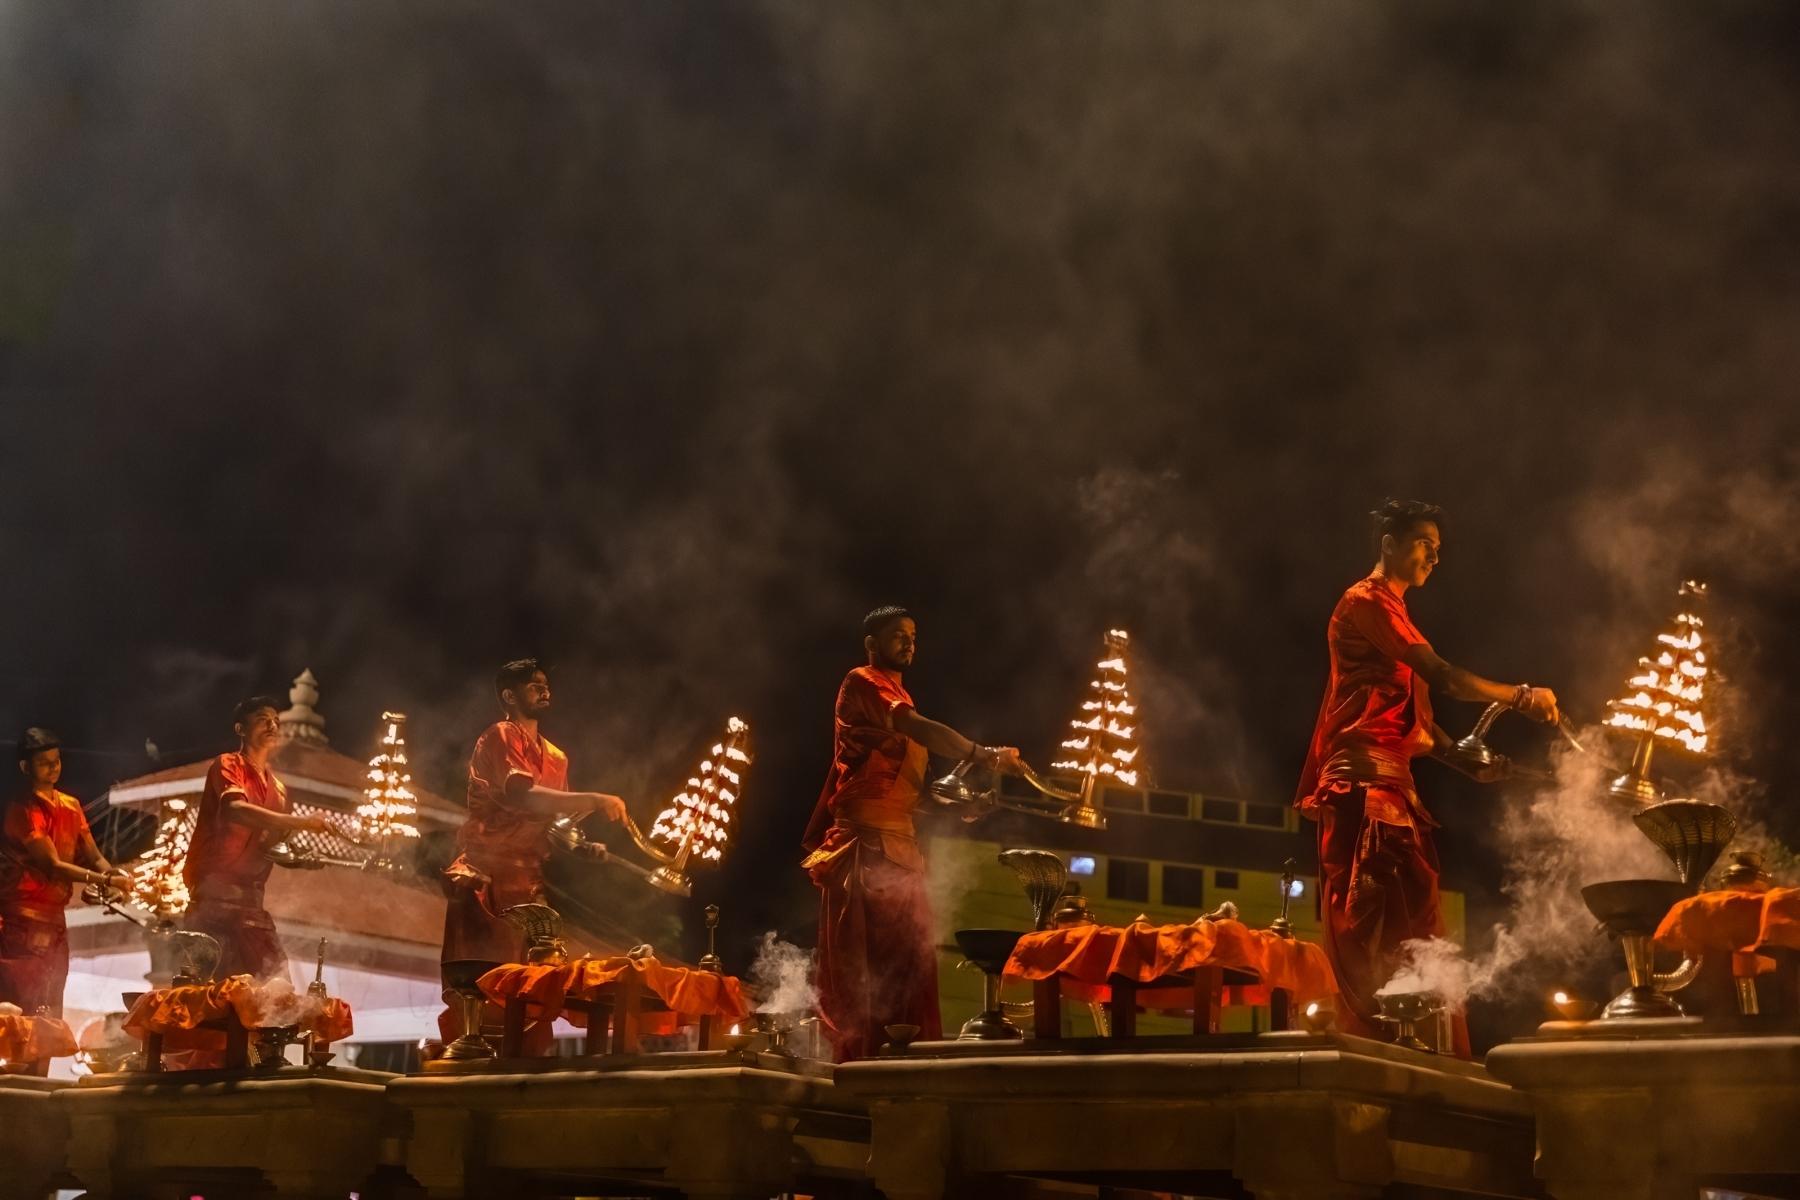 Dev-Diwali-1-Celebrated-every-year-in-the-sacred-city-of-Varanasi-India-Dev-Diwali-marks-Lord-Shivas-victory-over-demon-Tripurasur-JM-1-Place-by-Rajani-Ramanathan-LV